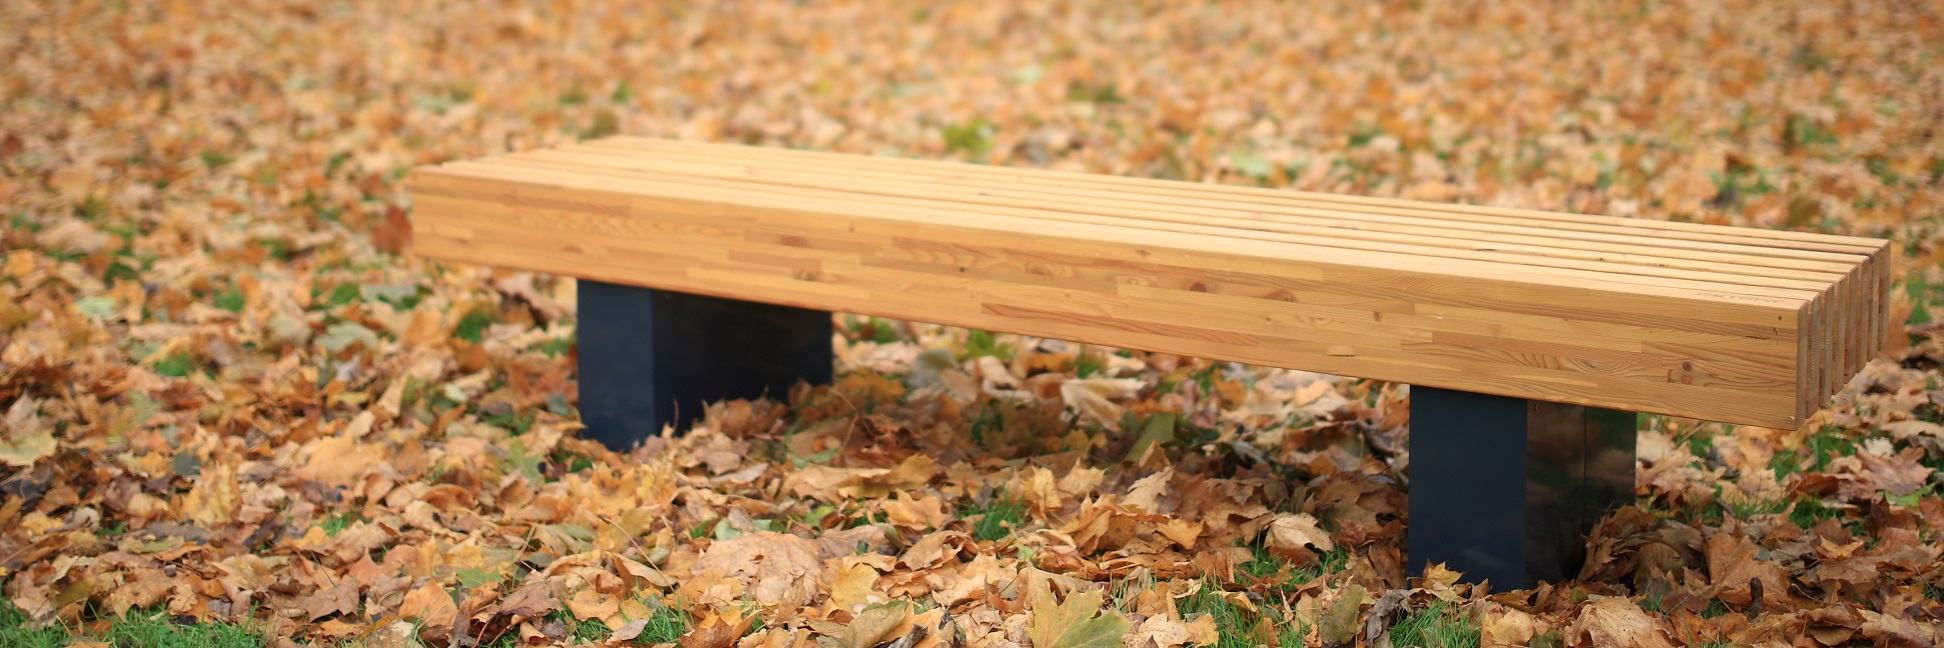 park bench Nippon, without backrest